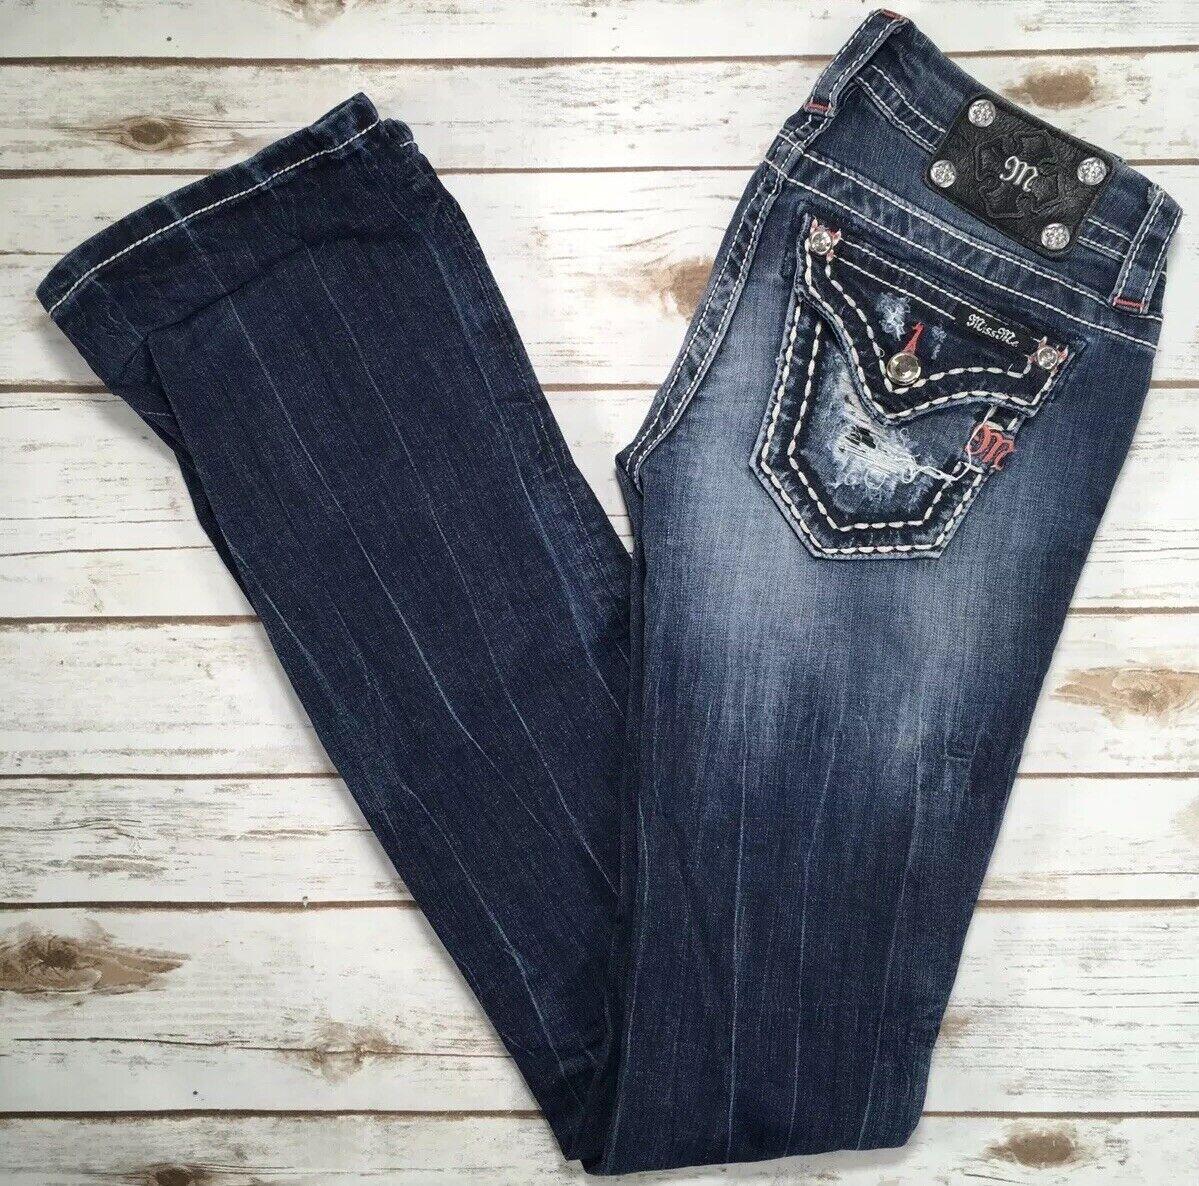 Womens Miss Me Jeans Low Rise Blowout Flap Bootcut Stretch 25 X 37 READ DESCRIP